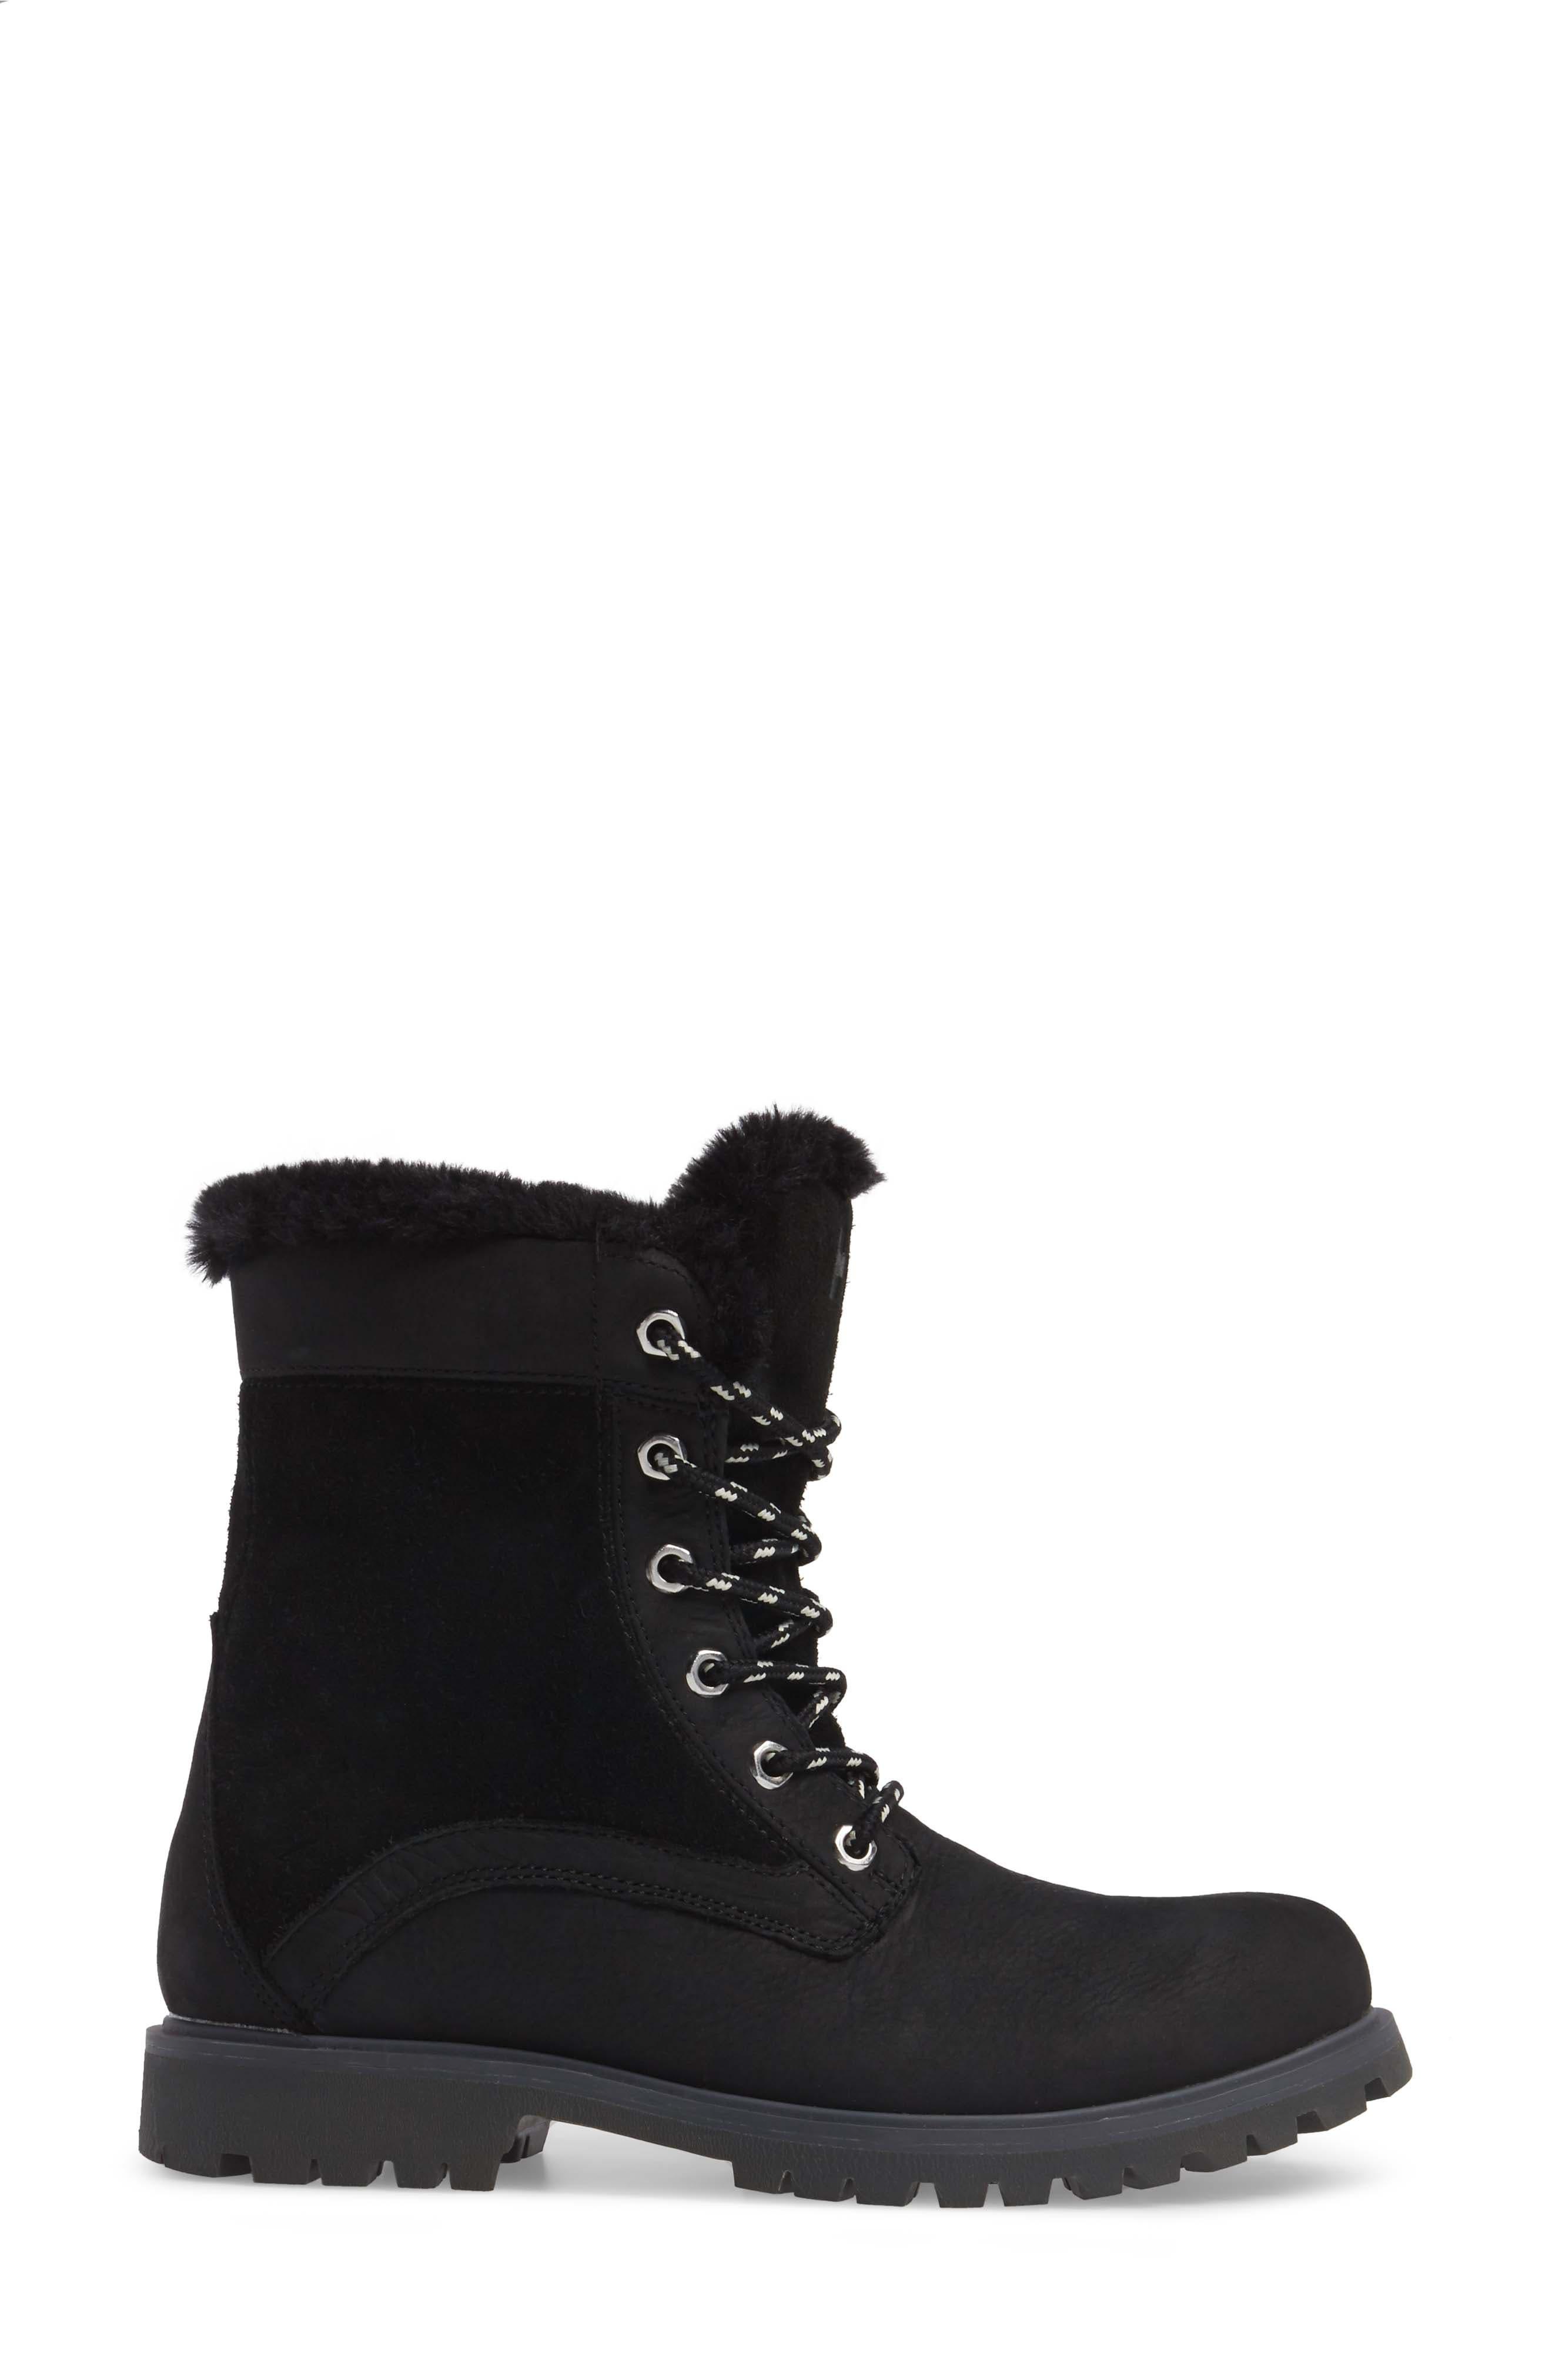 Marion Waterproof Winter Boot,                             Alternate thumbnail 3, color,                             Jet Black / Ebony / Black